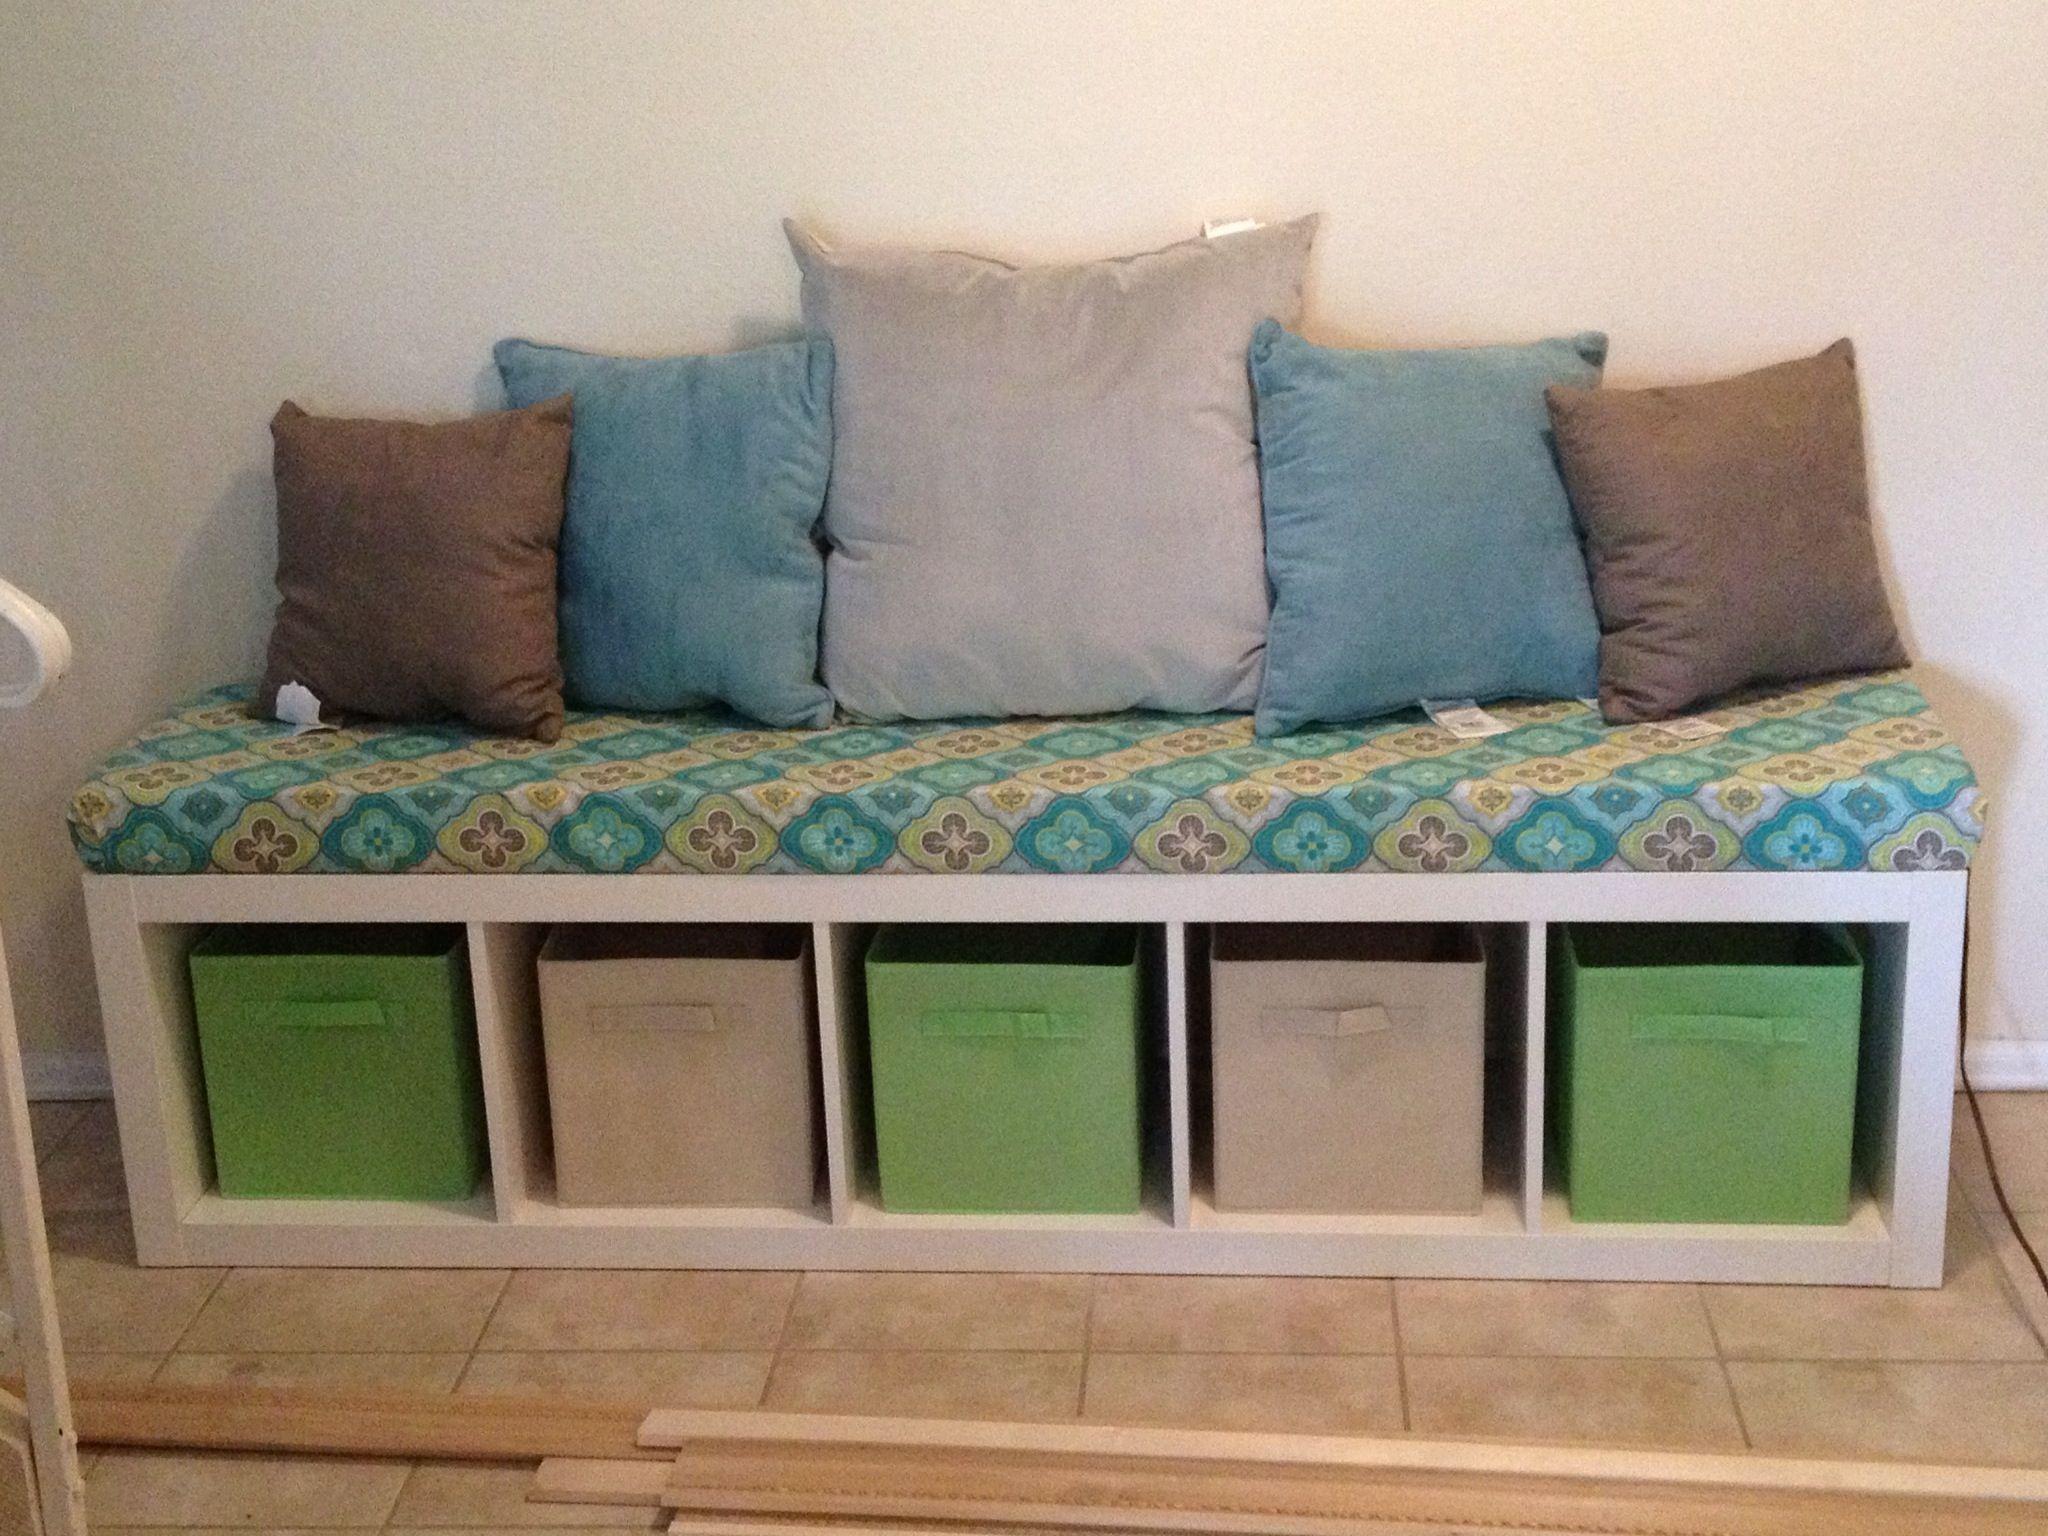 ikea expedit bookshelf bench for reading area nook in basement